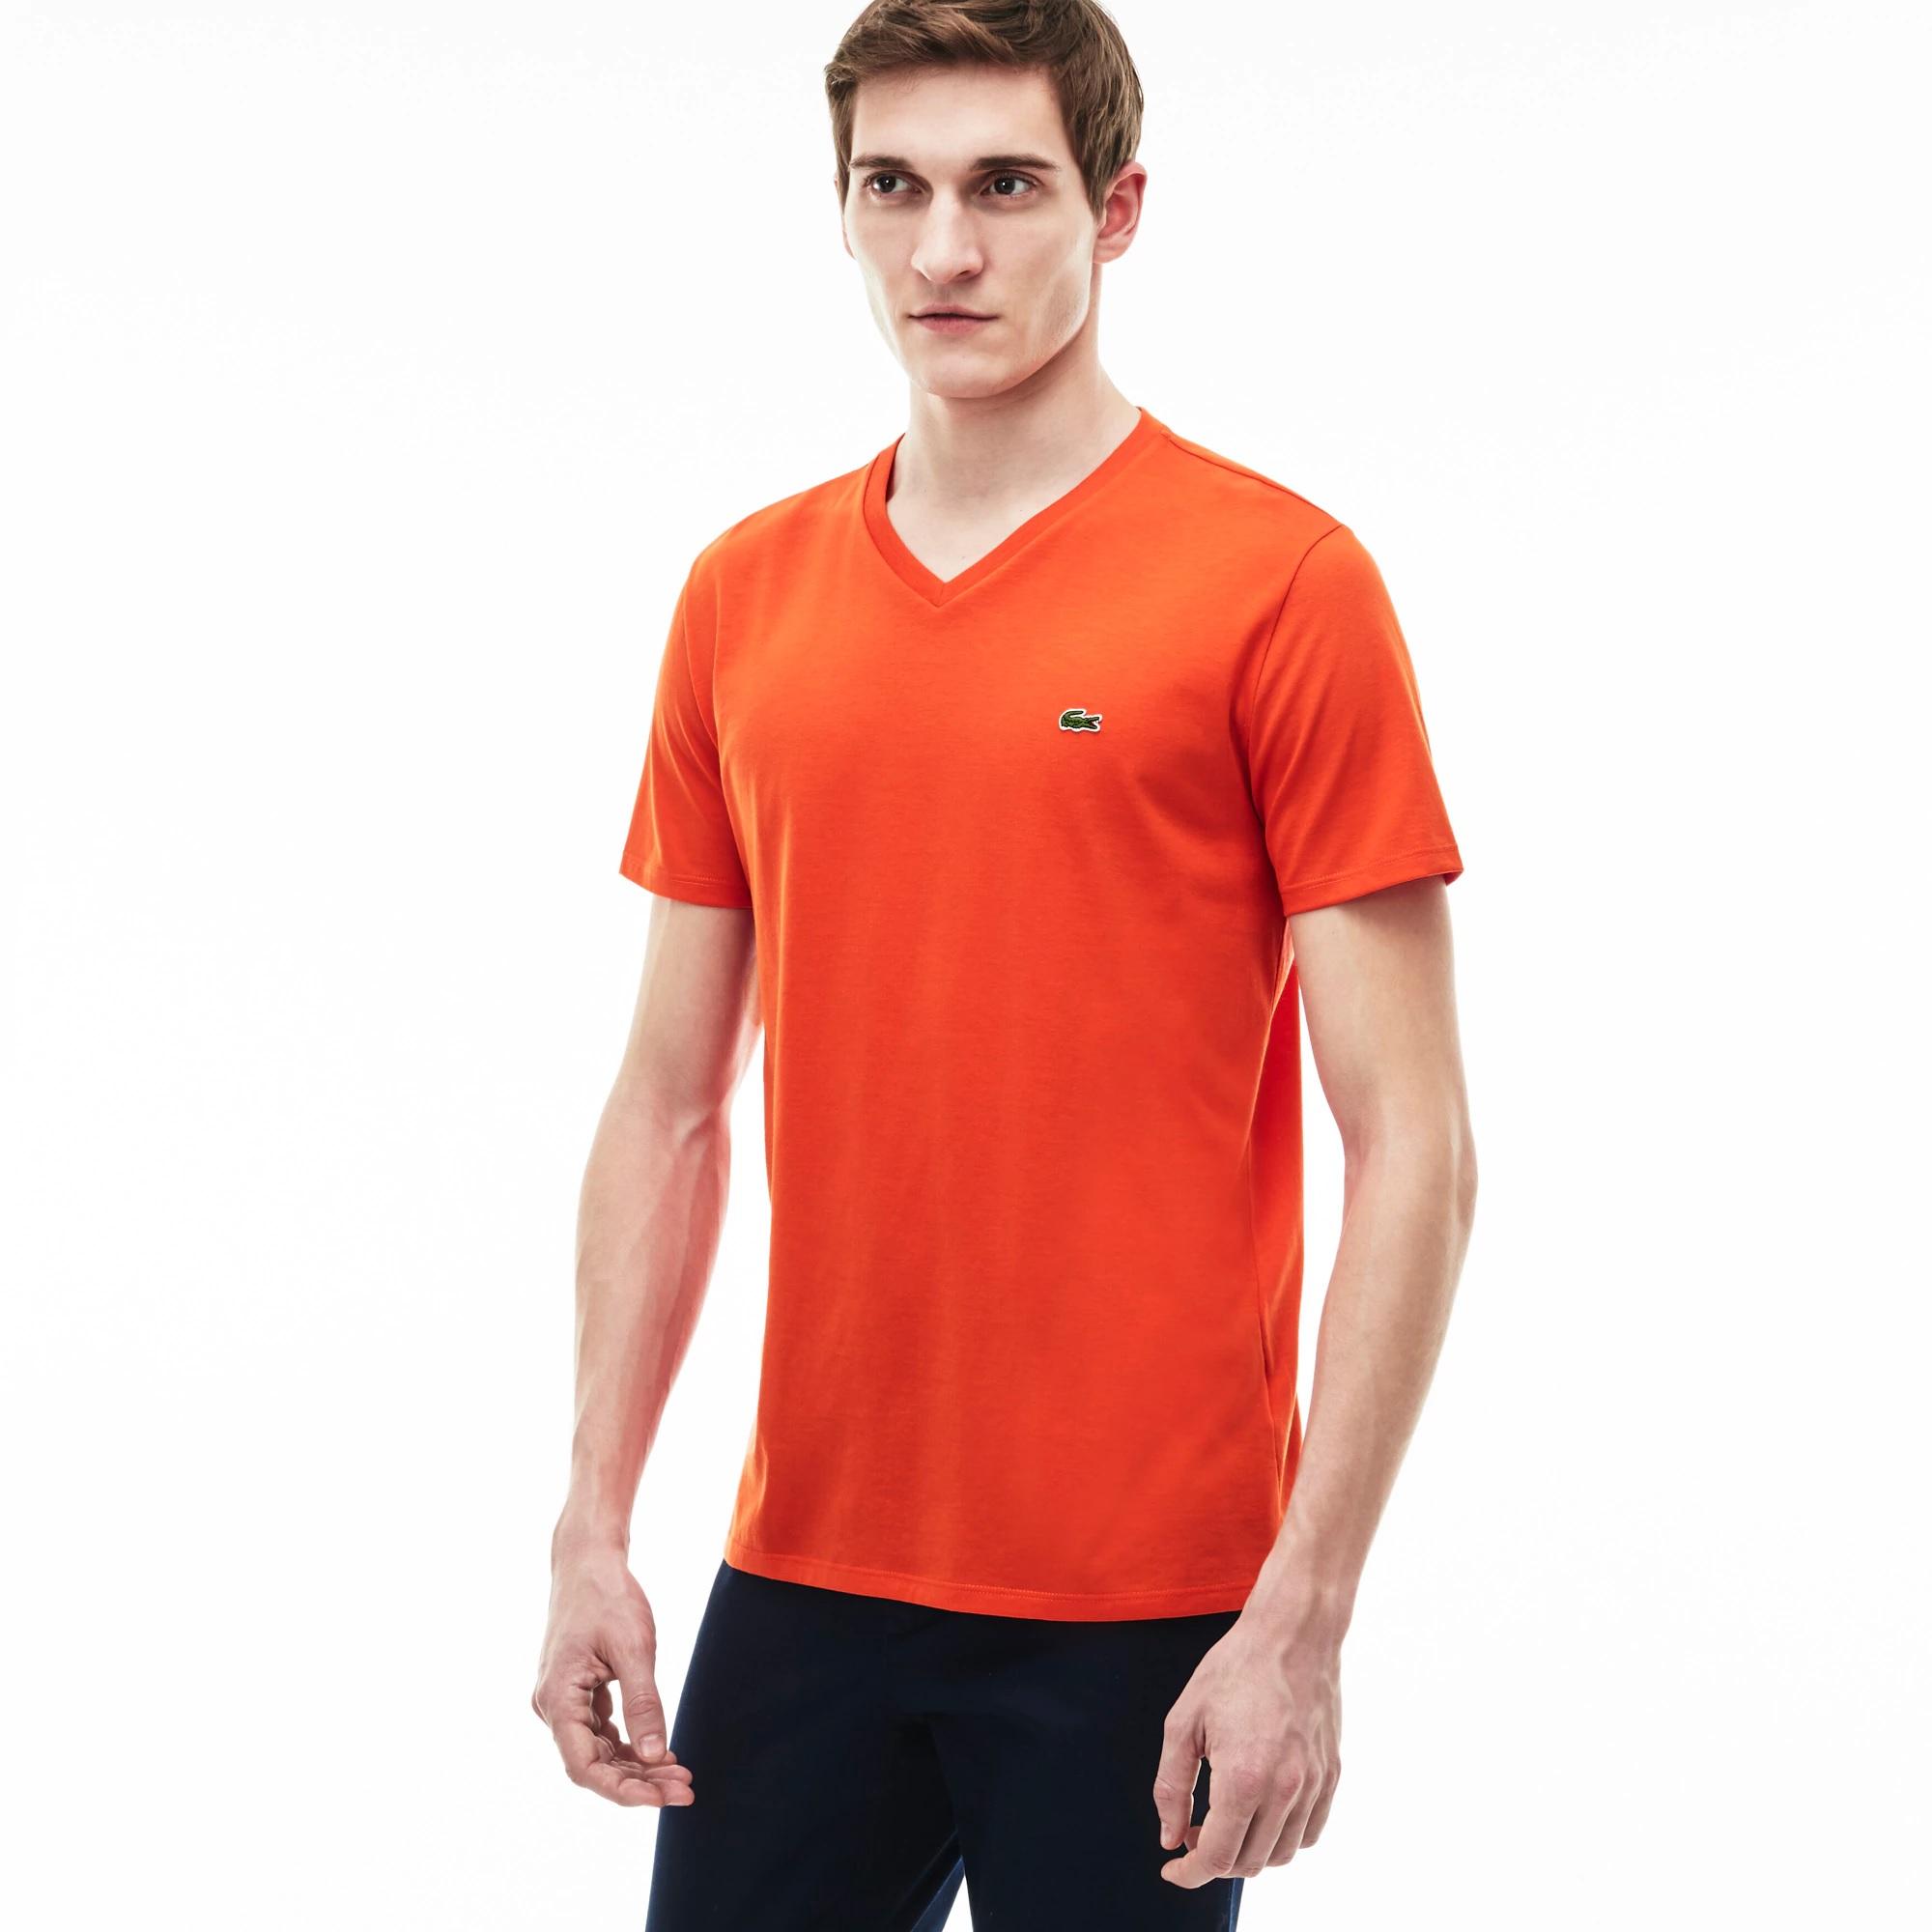 Lacoste Men's V-neck Pima Cotton Jersey T-shirt Tangelo Orange Large